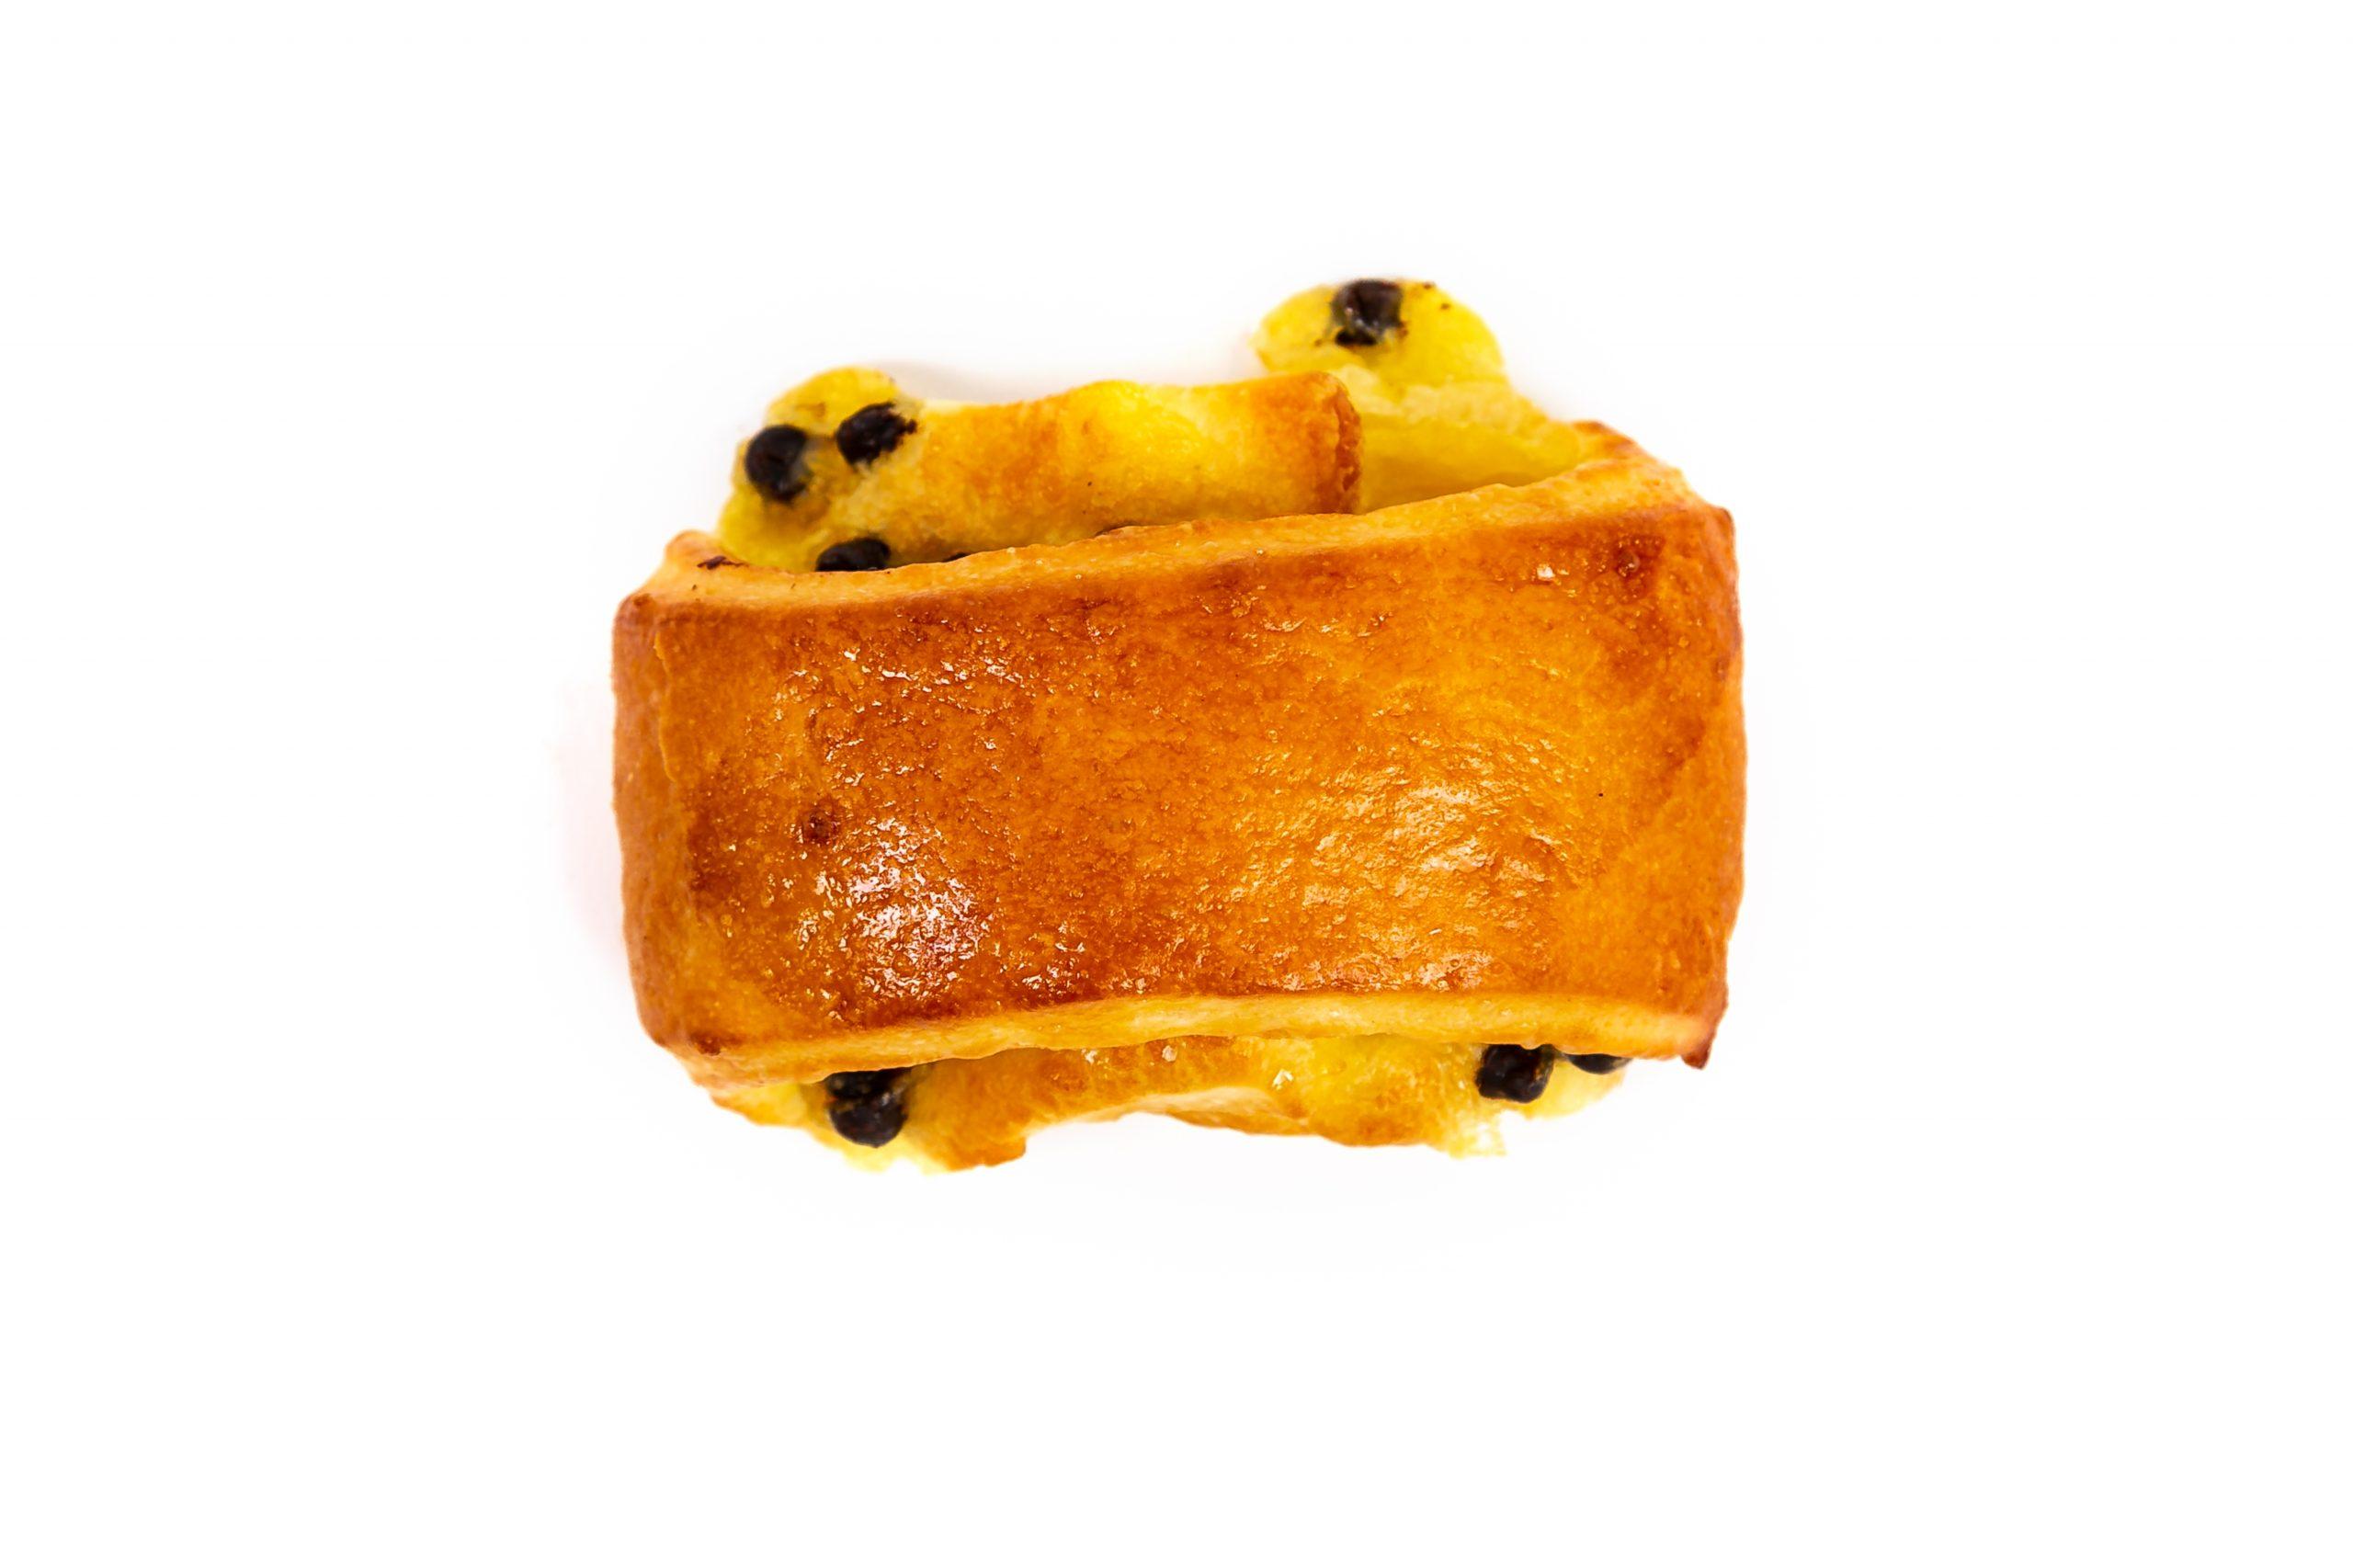 Petit pain suisse